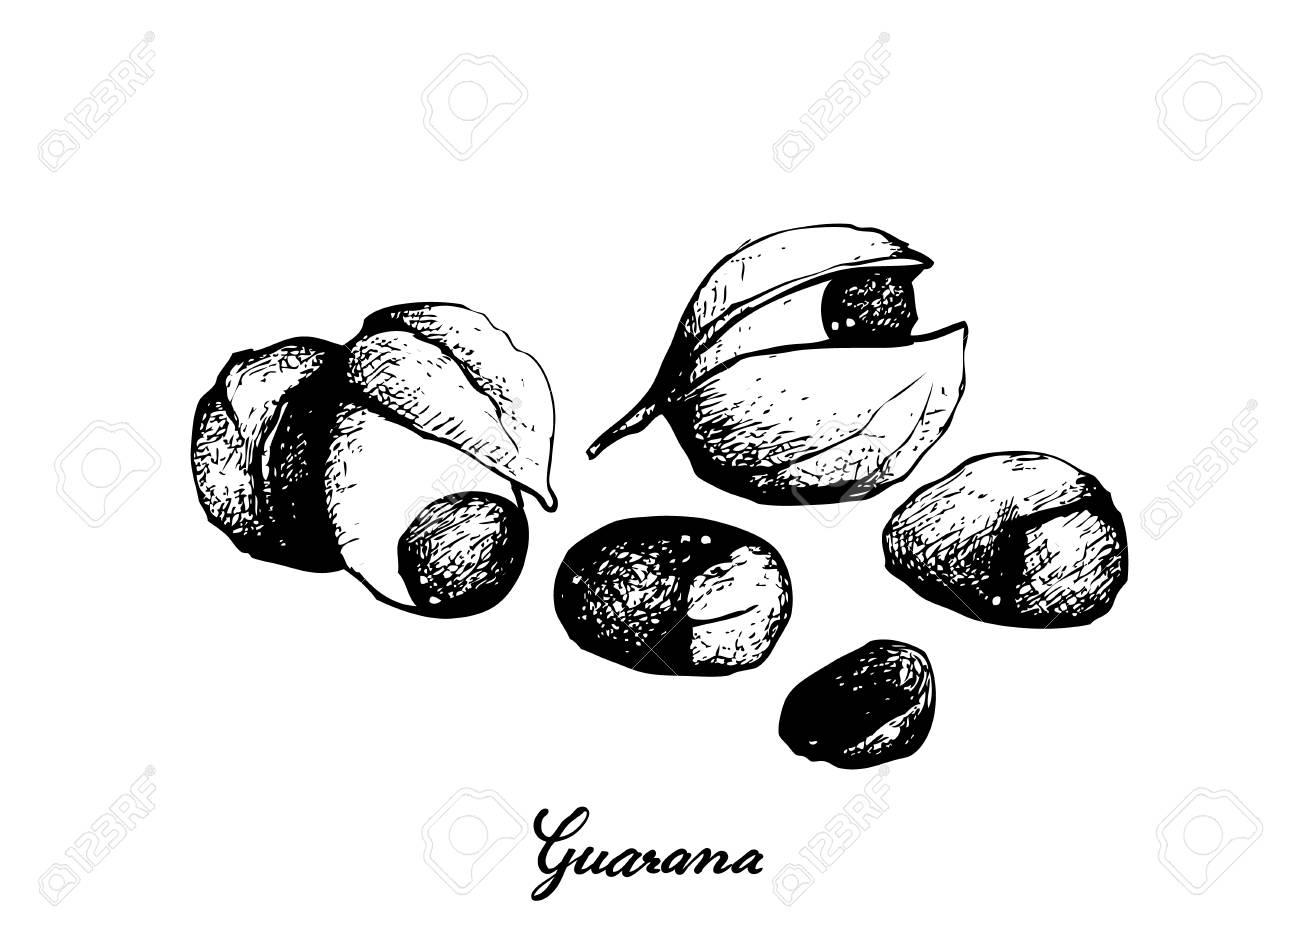 Vegetable, Illustration of Red Guarana or Paullinia Cupana Fruits Isolated on White Background. - 126722708